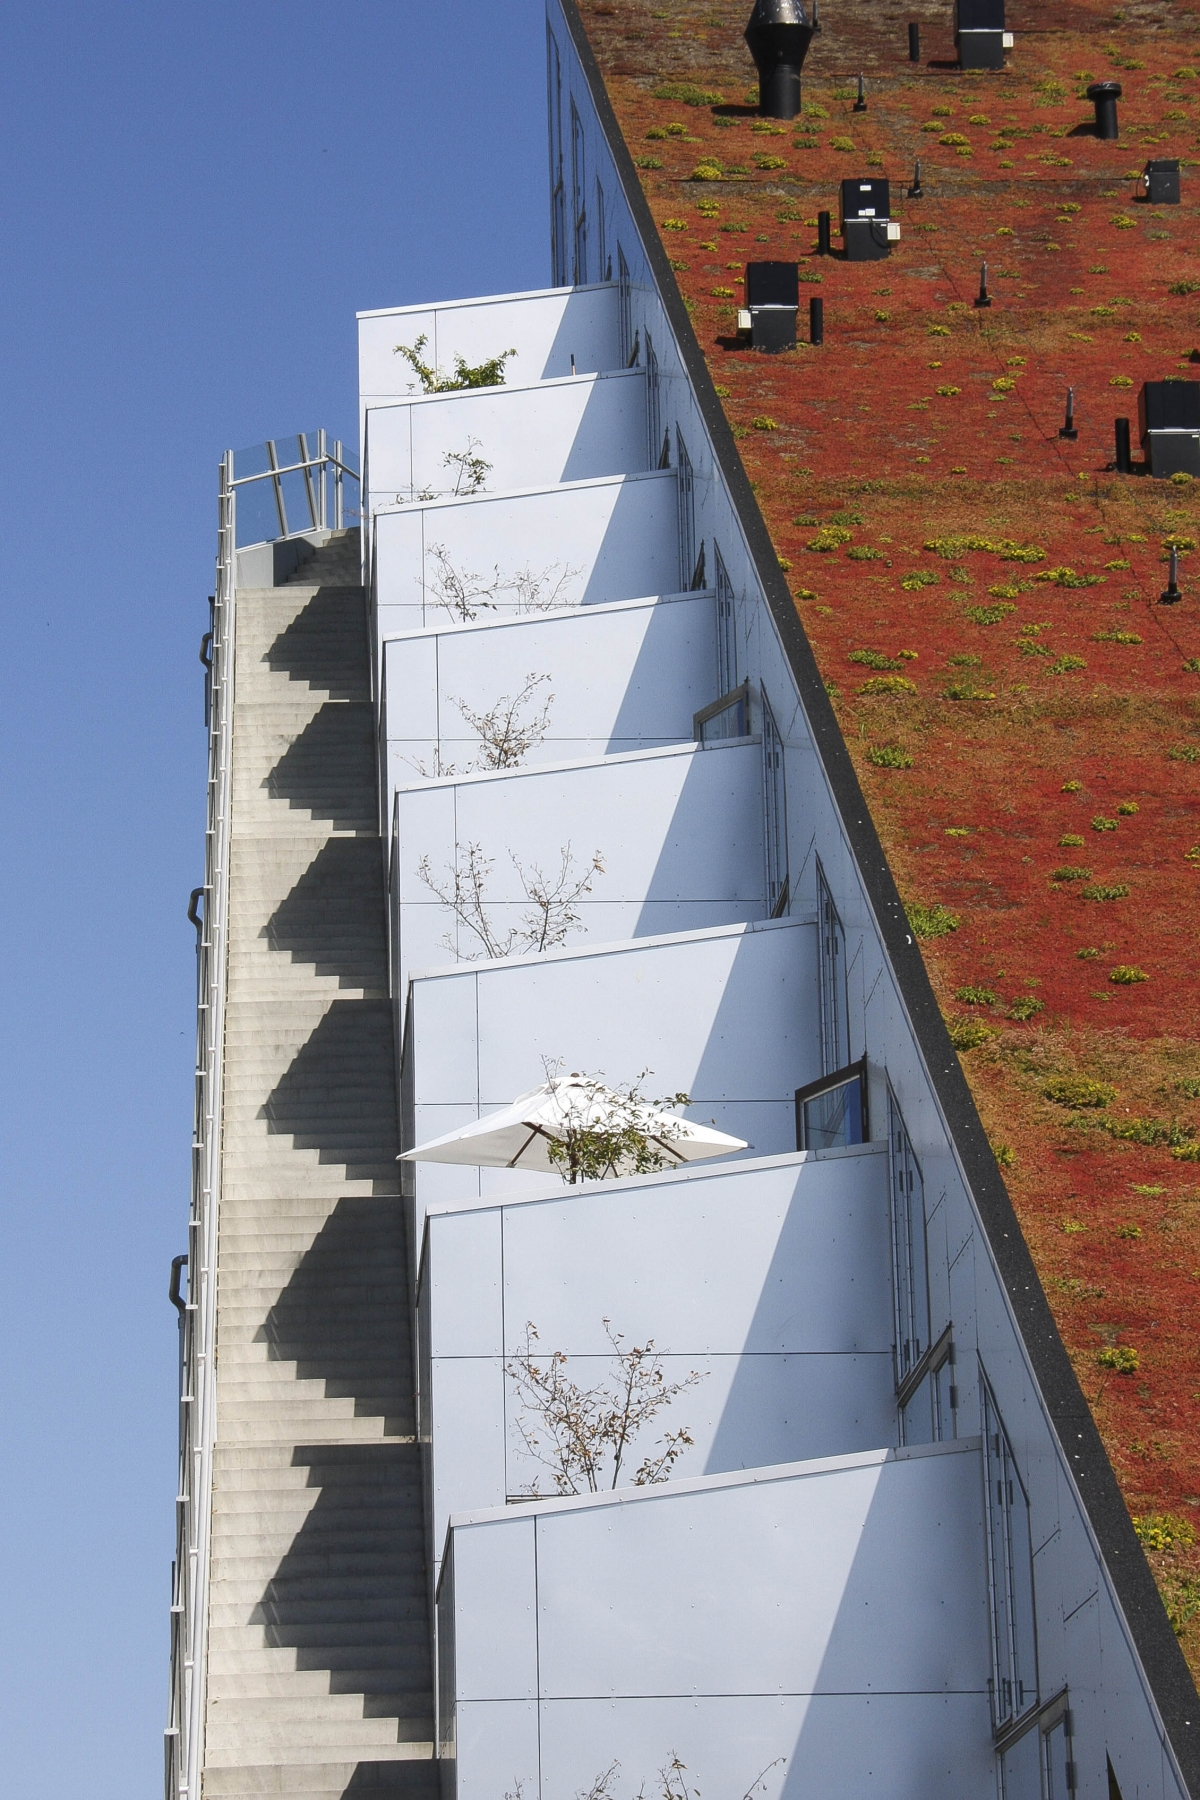 'Vertical living' by Piotr Chlapowski